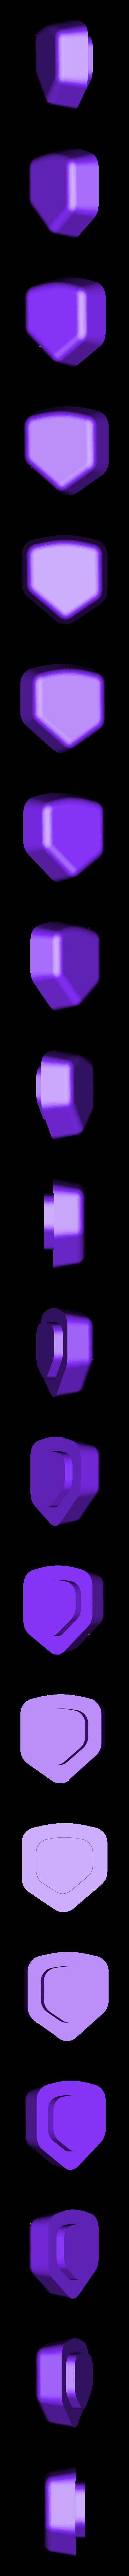 Banane_3D_2_tete_marron.STL Download free STL file Lulu's Banana box • 3D printing model, lulu3Dbuilder